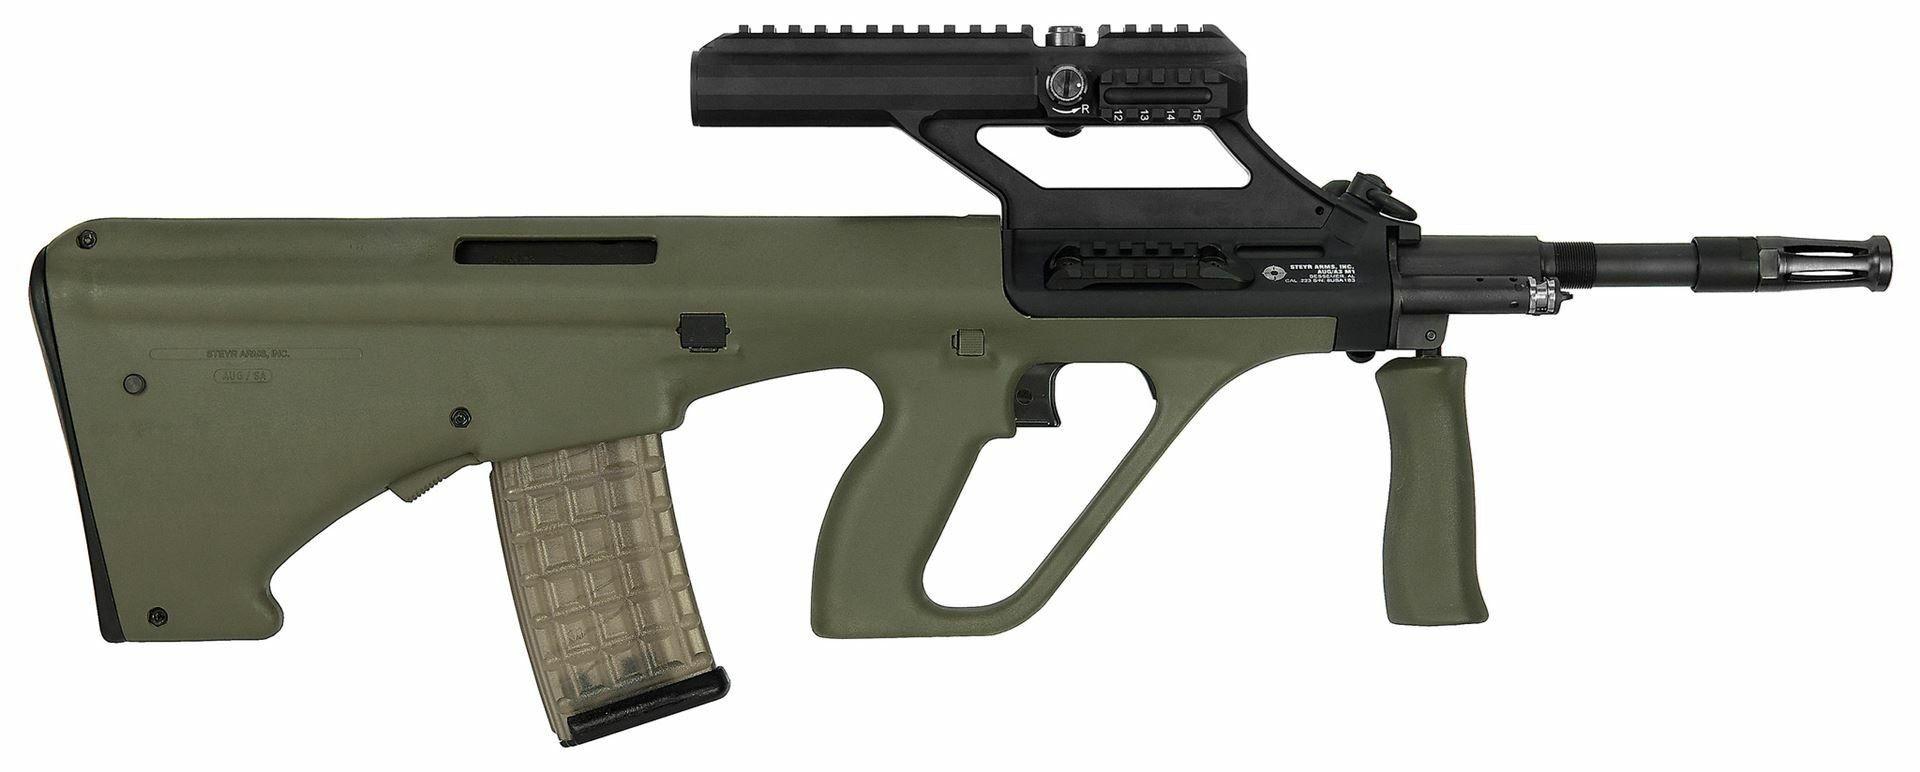 Pin by Ricardo Rodriguez on guns 4 | Steyr, Guns, Assault rifle